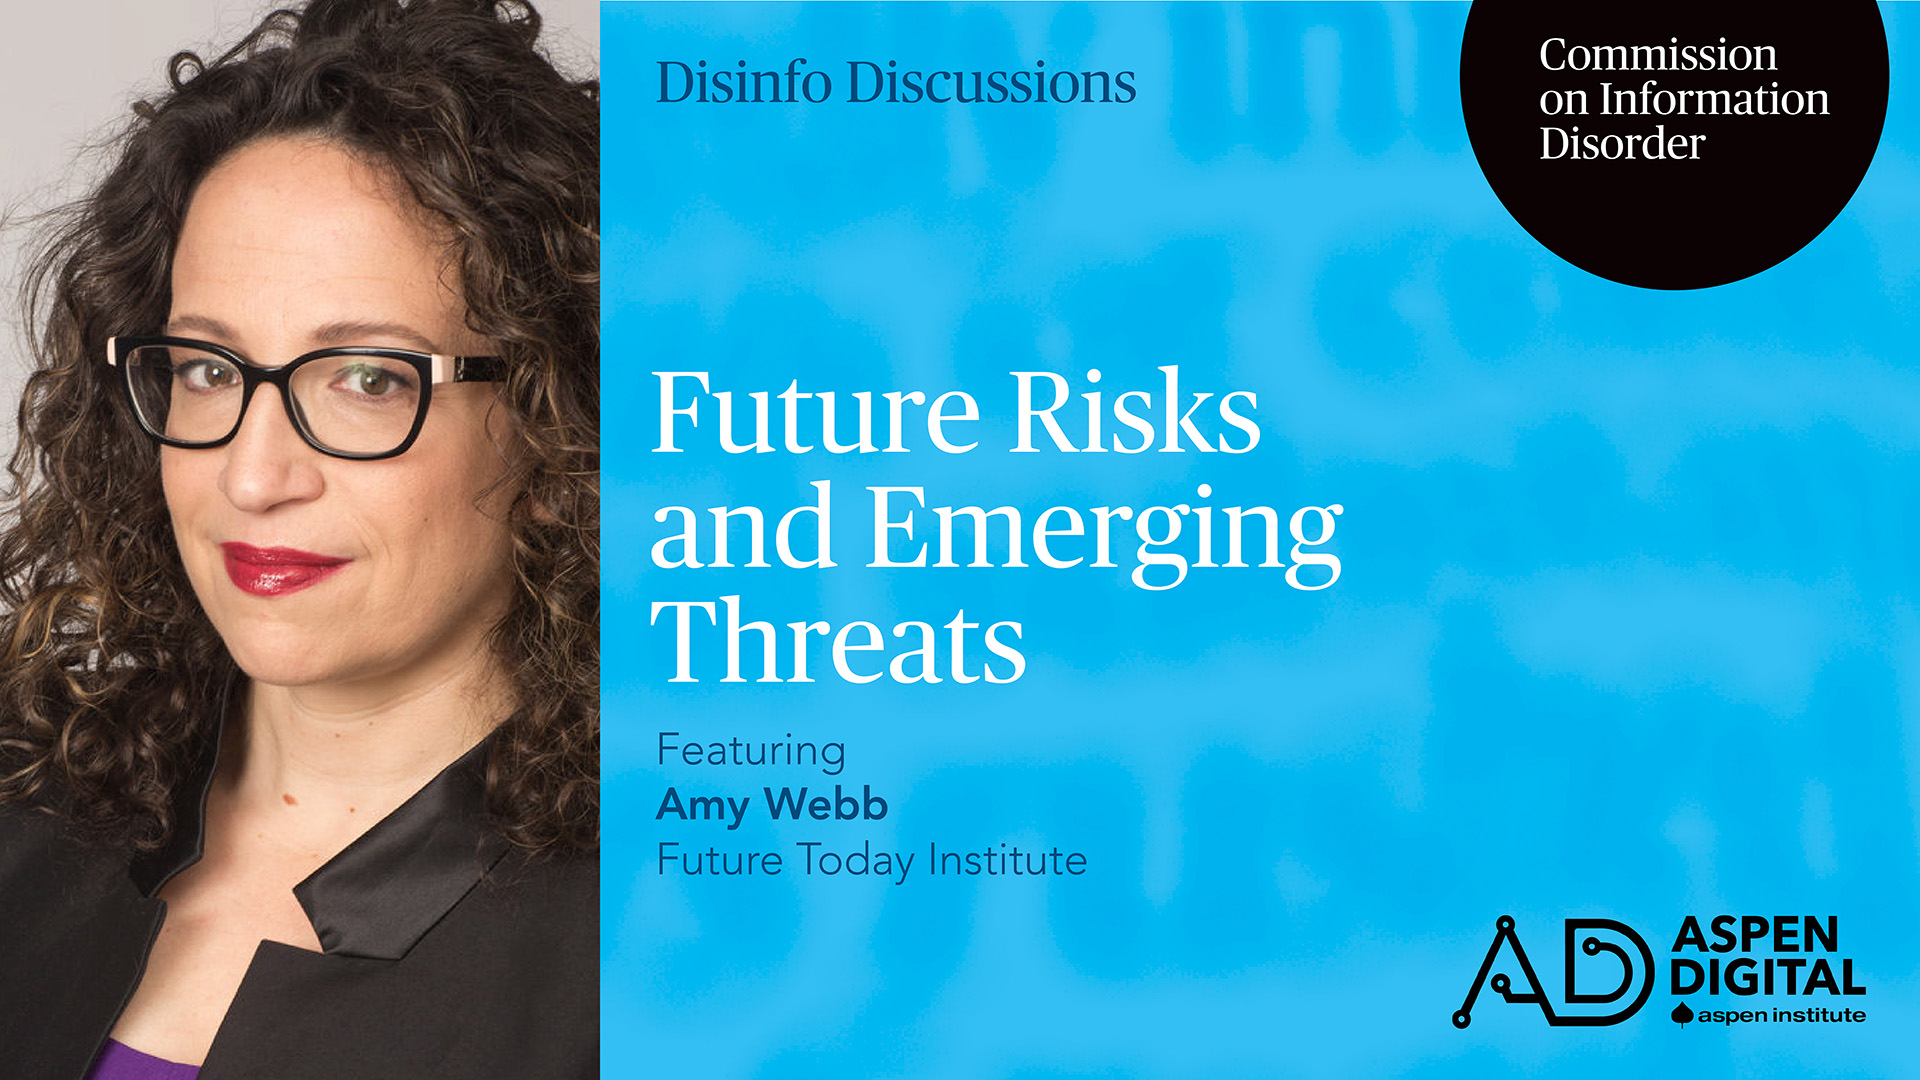 Future Risks and Emerging Threats